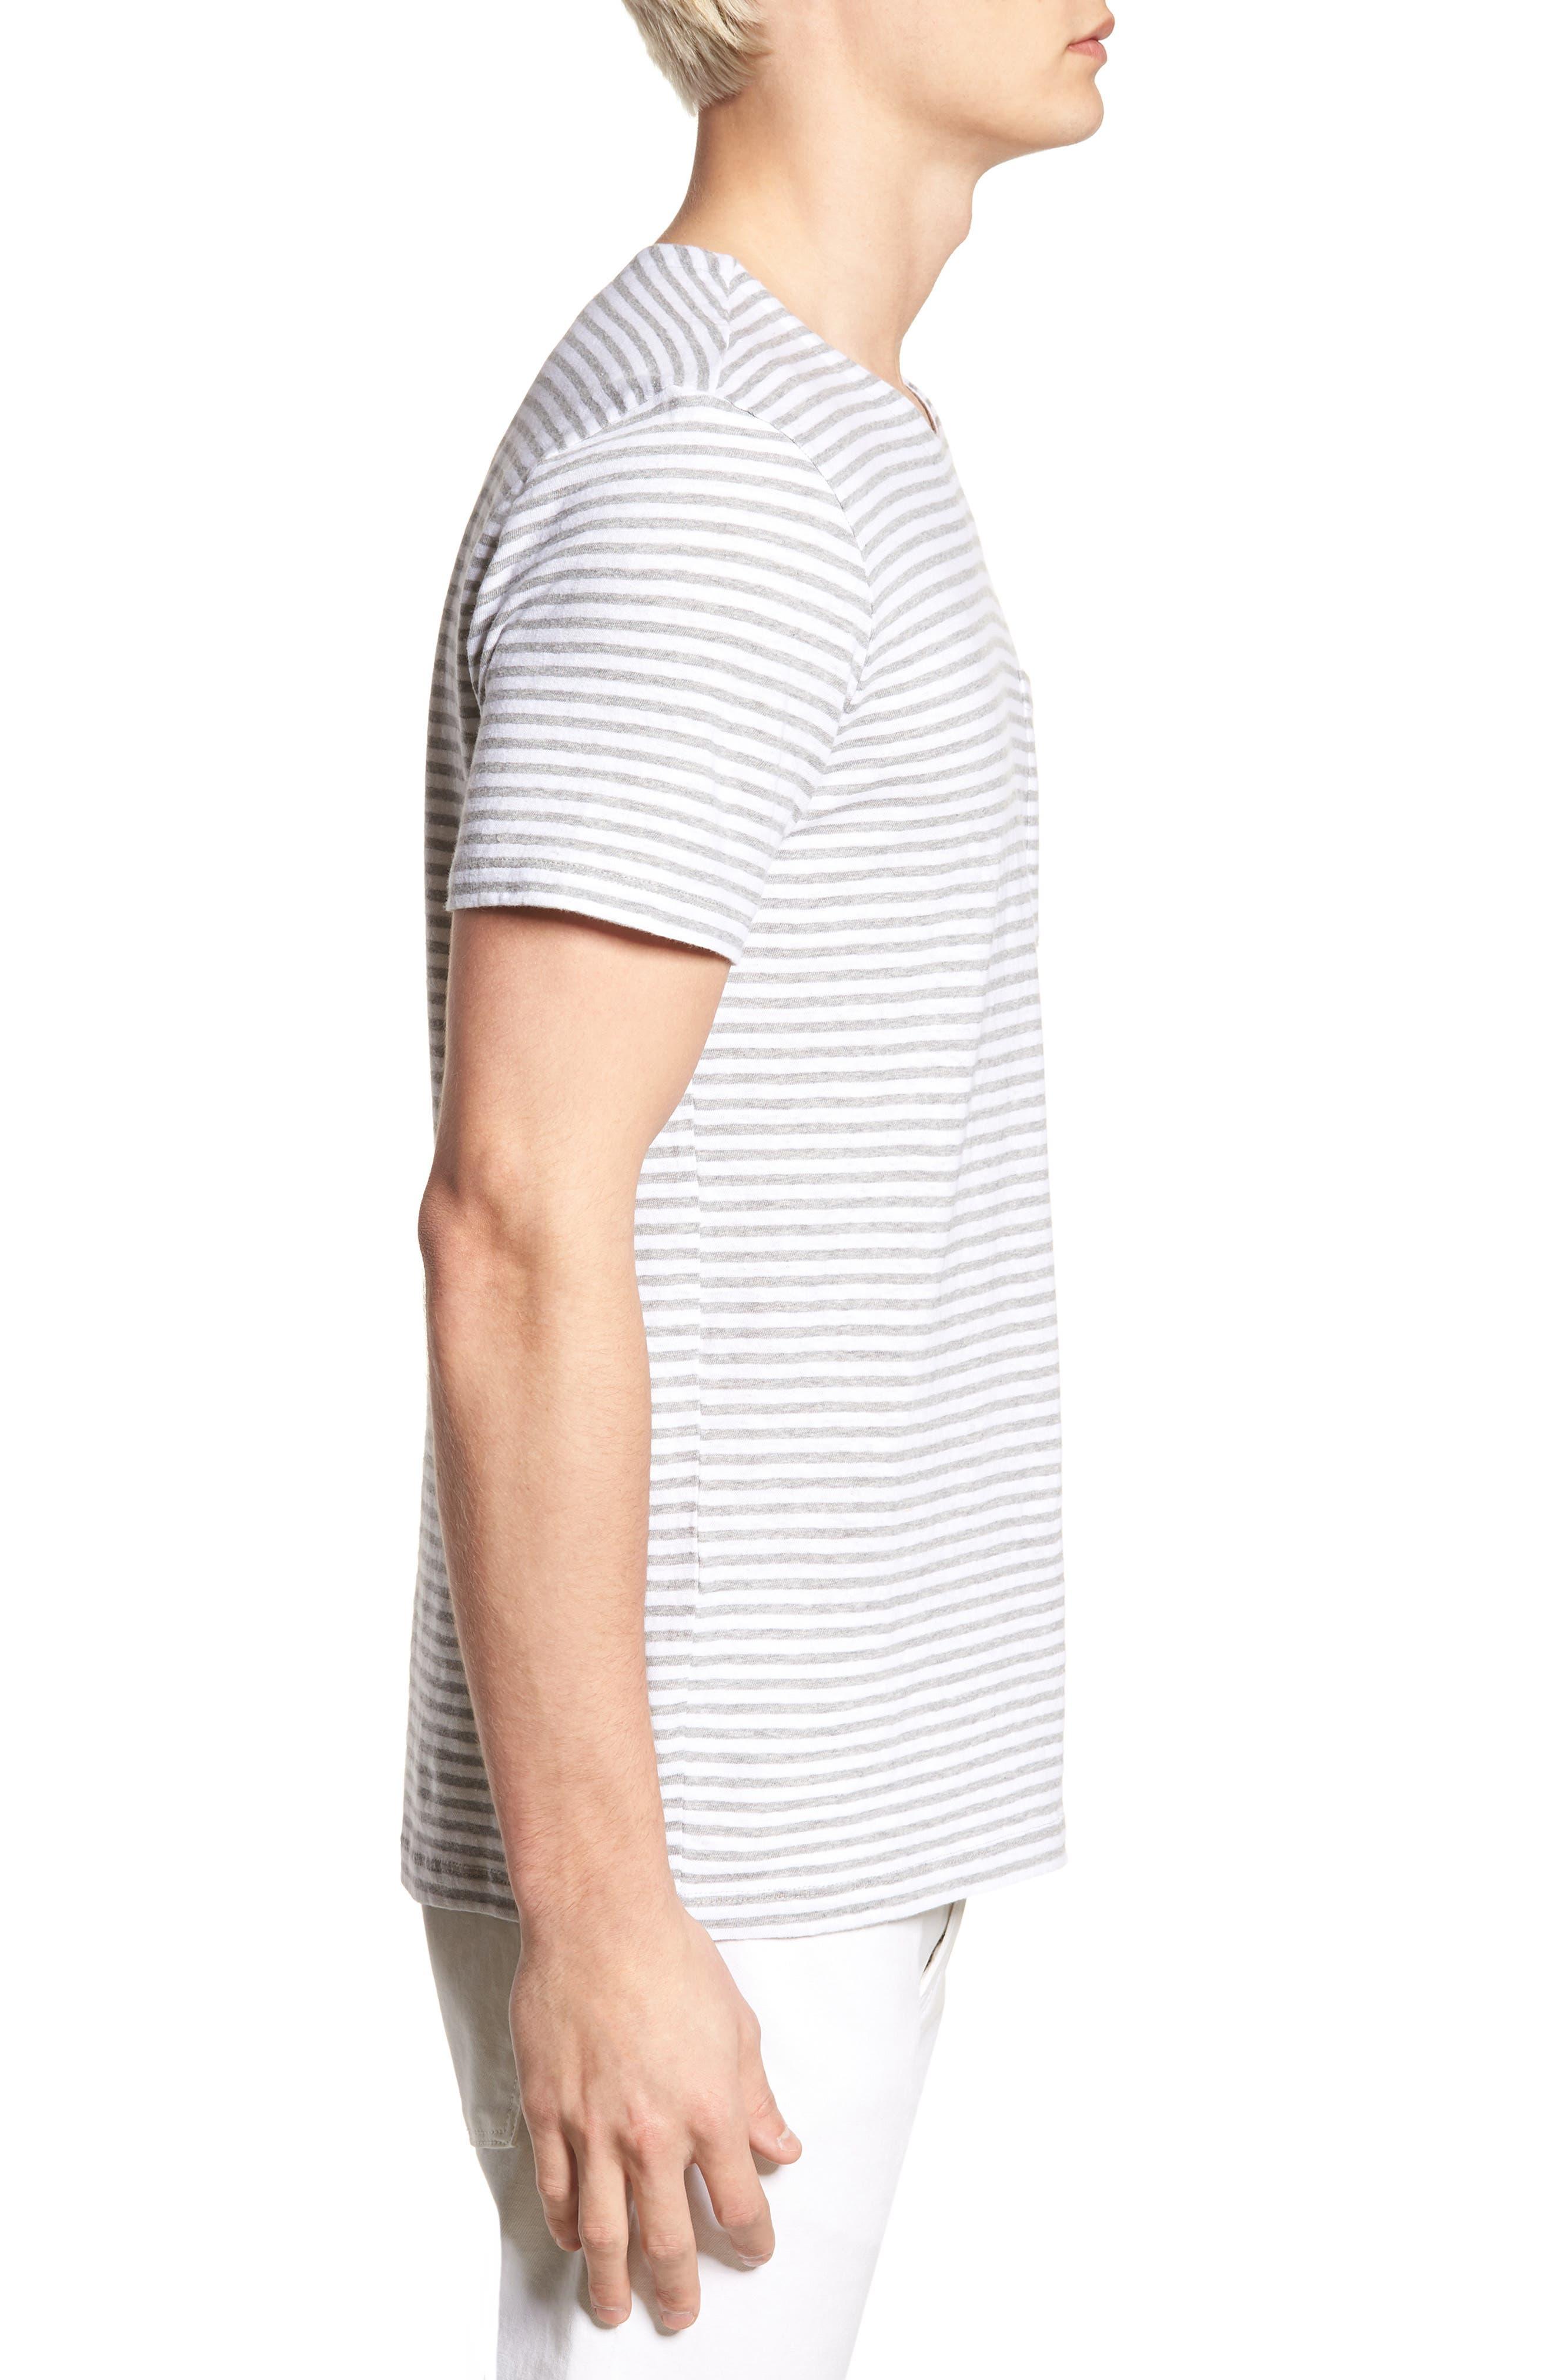 & Bros. Stripe Crewneck T-Shirt,                             Alternate thumbnail 3, color,                             156